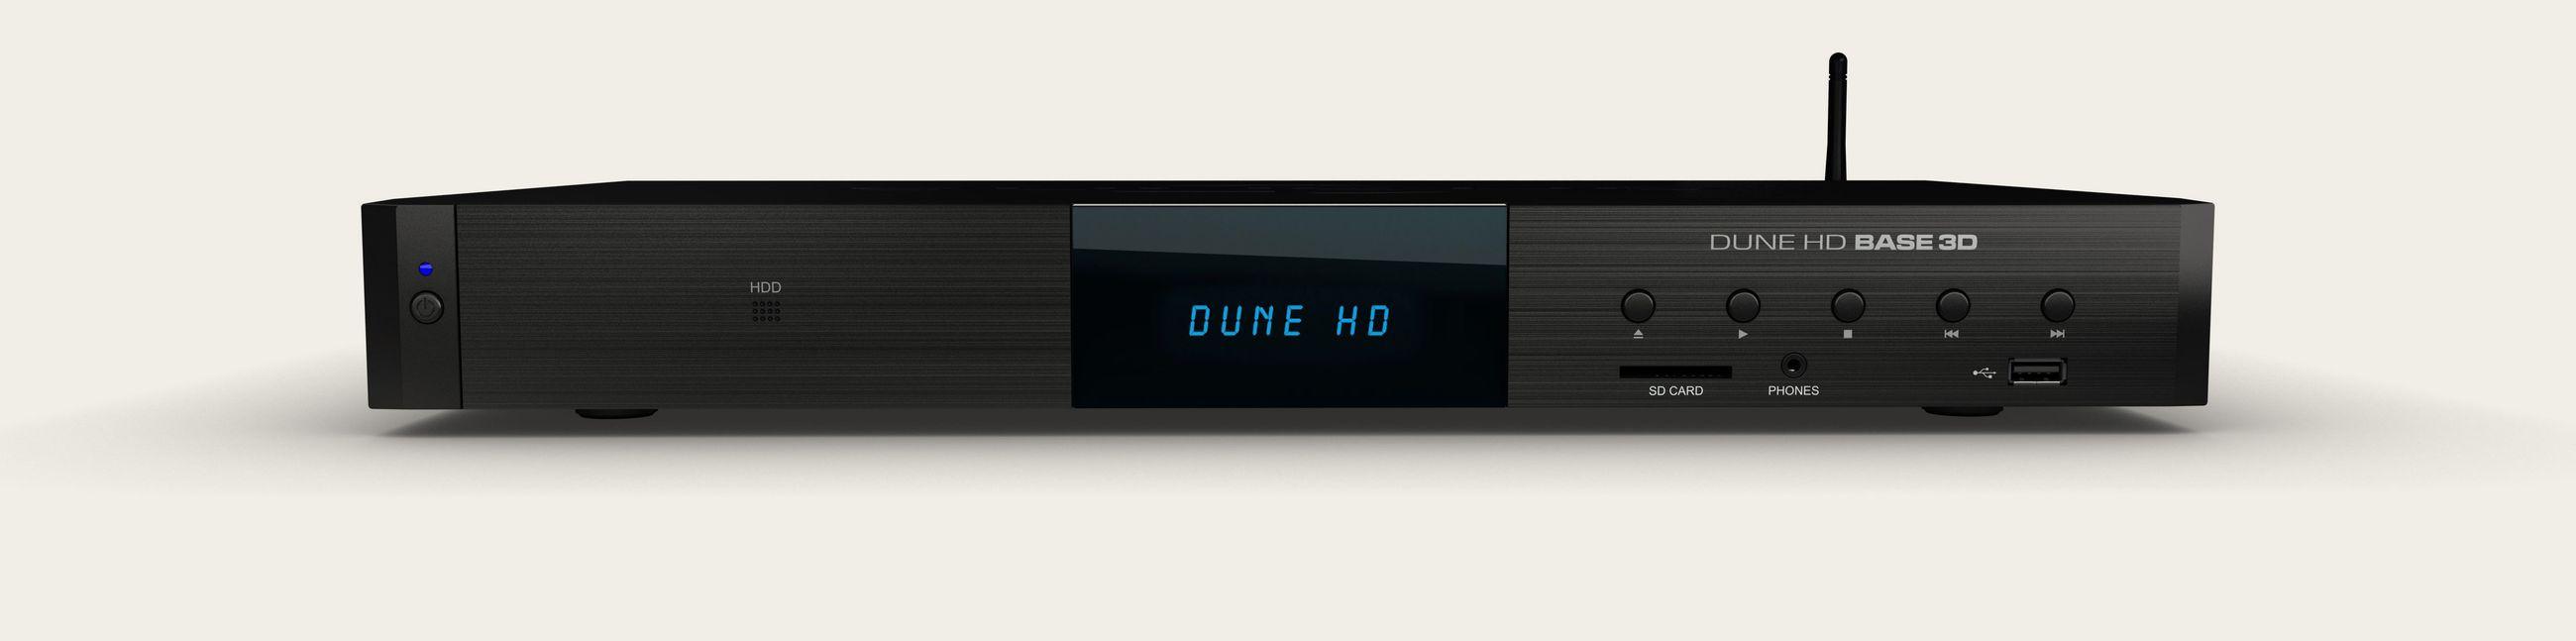 BASE 3D медиаплеер DUNE HD